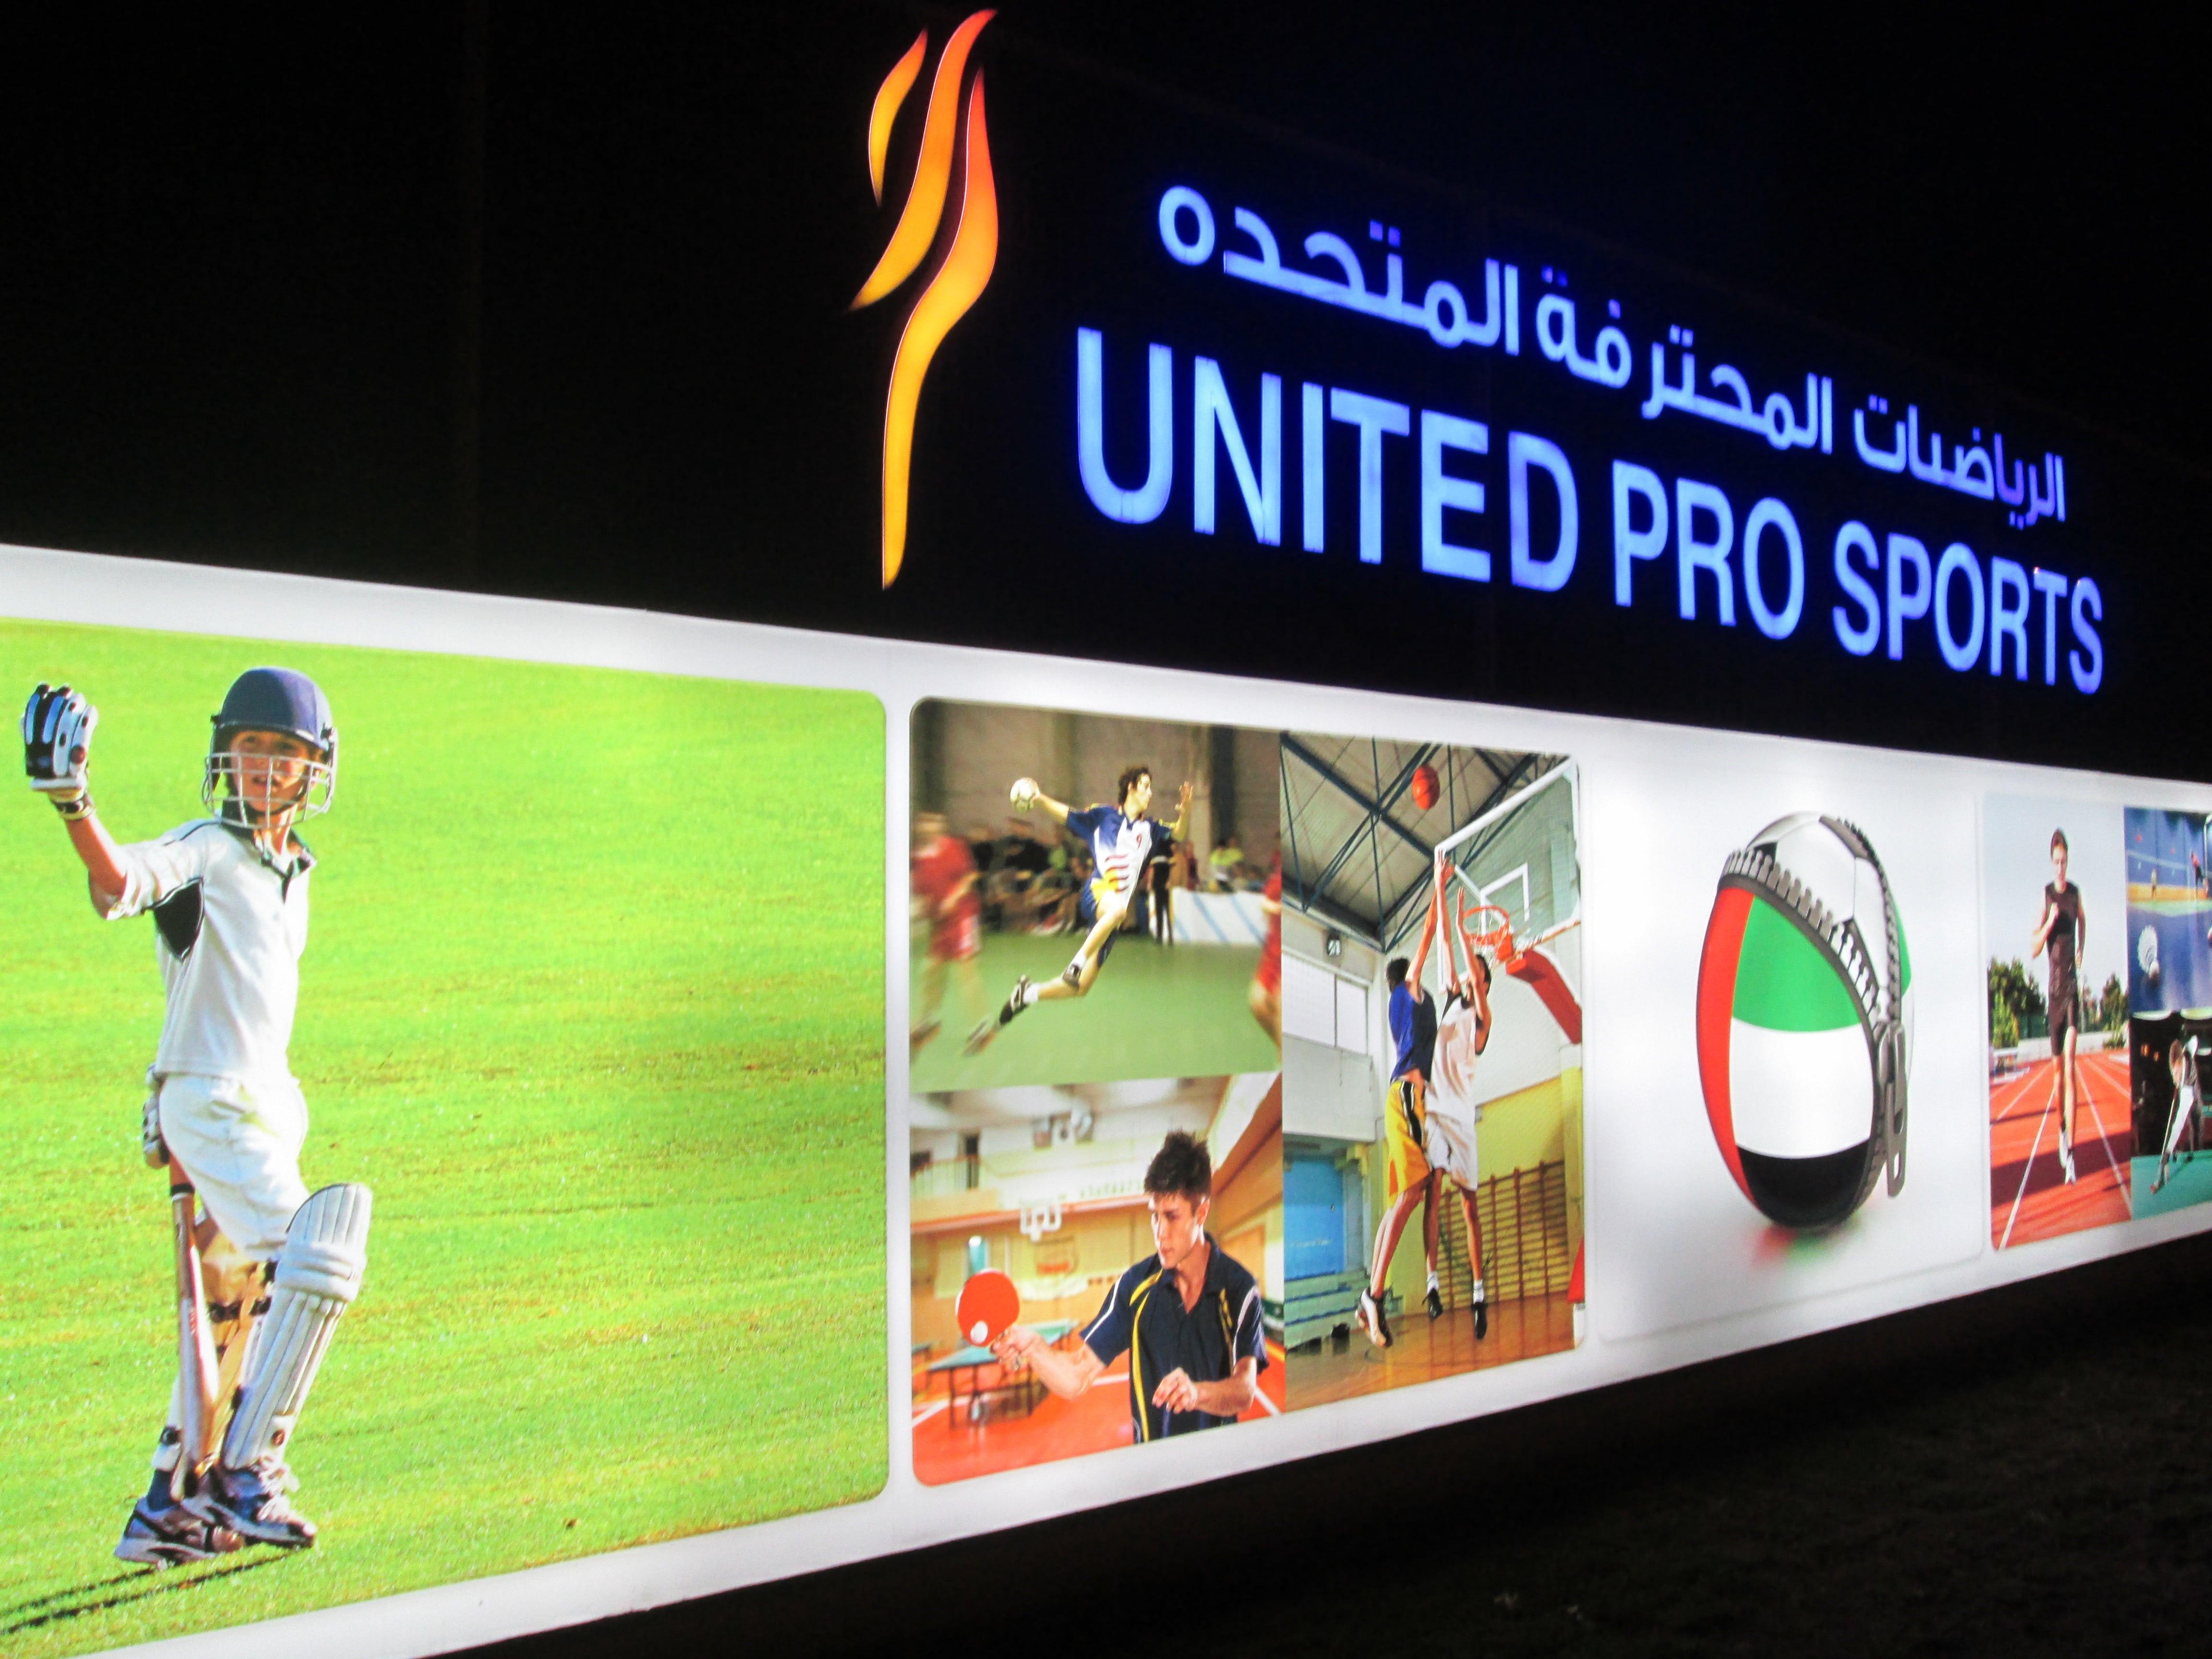 united pro sports